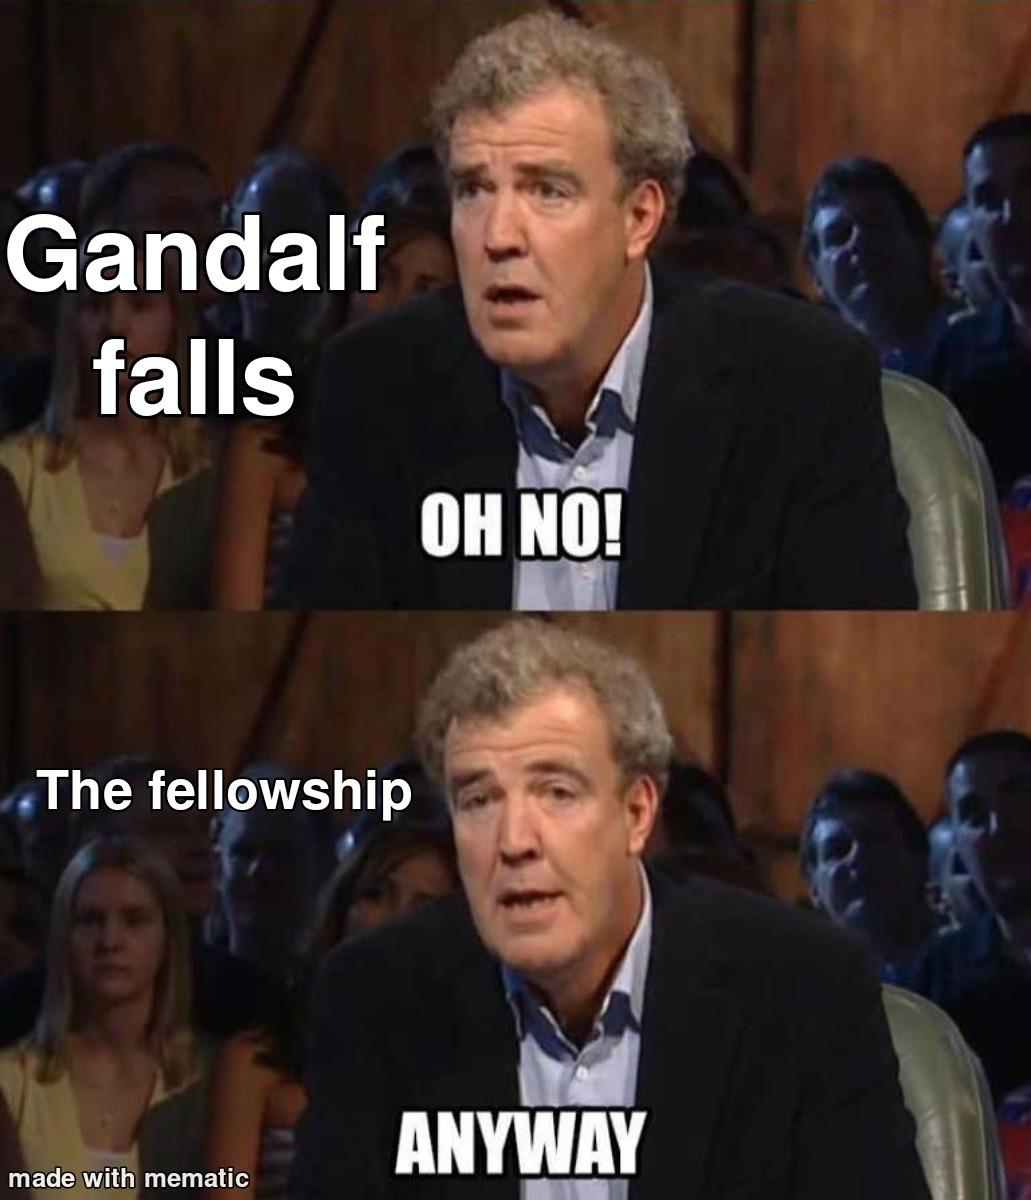 The fellowship of not giving a crap. - meme